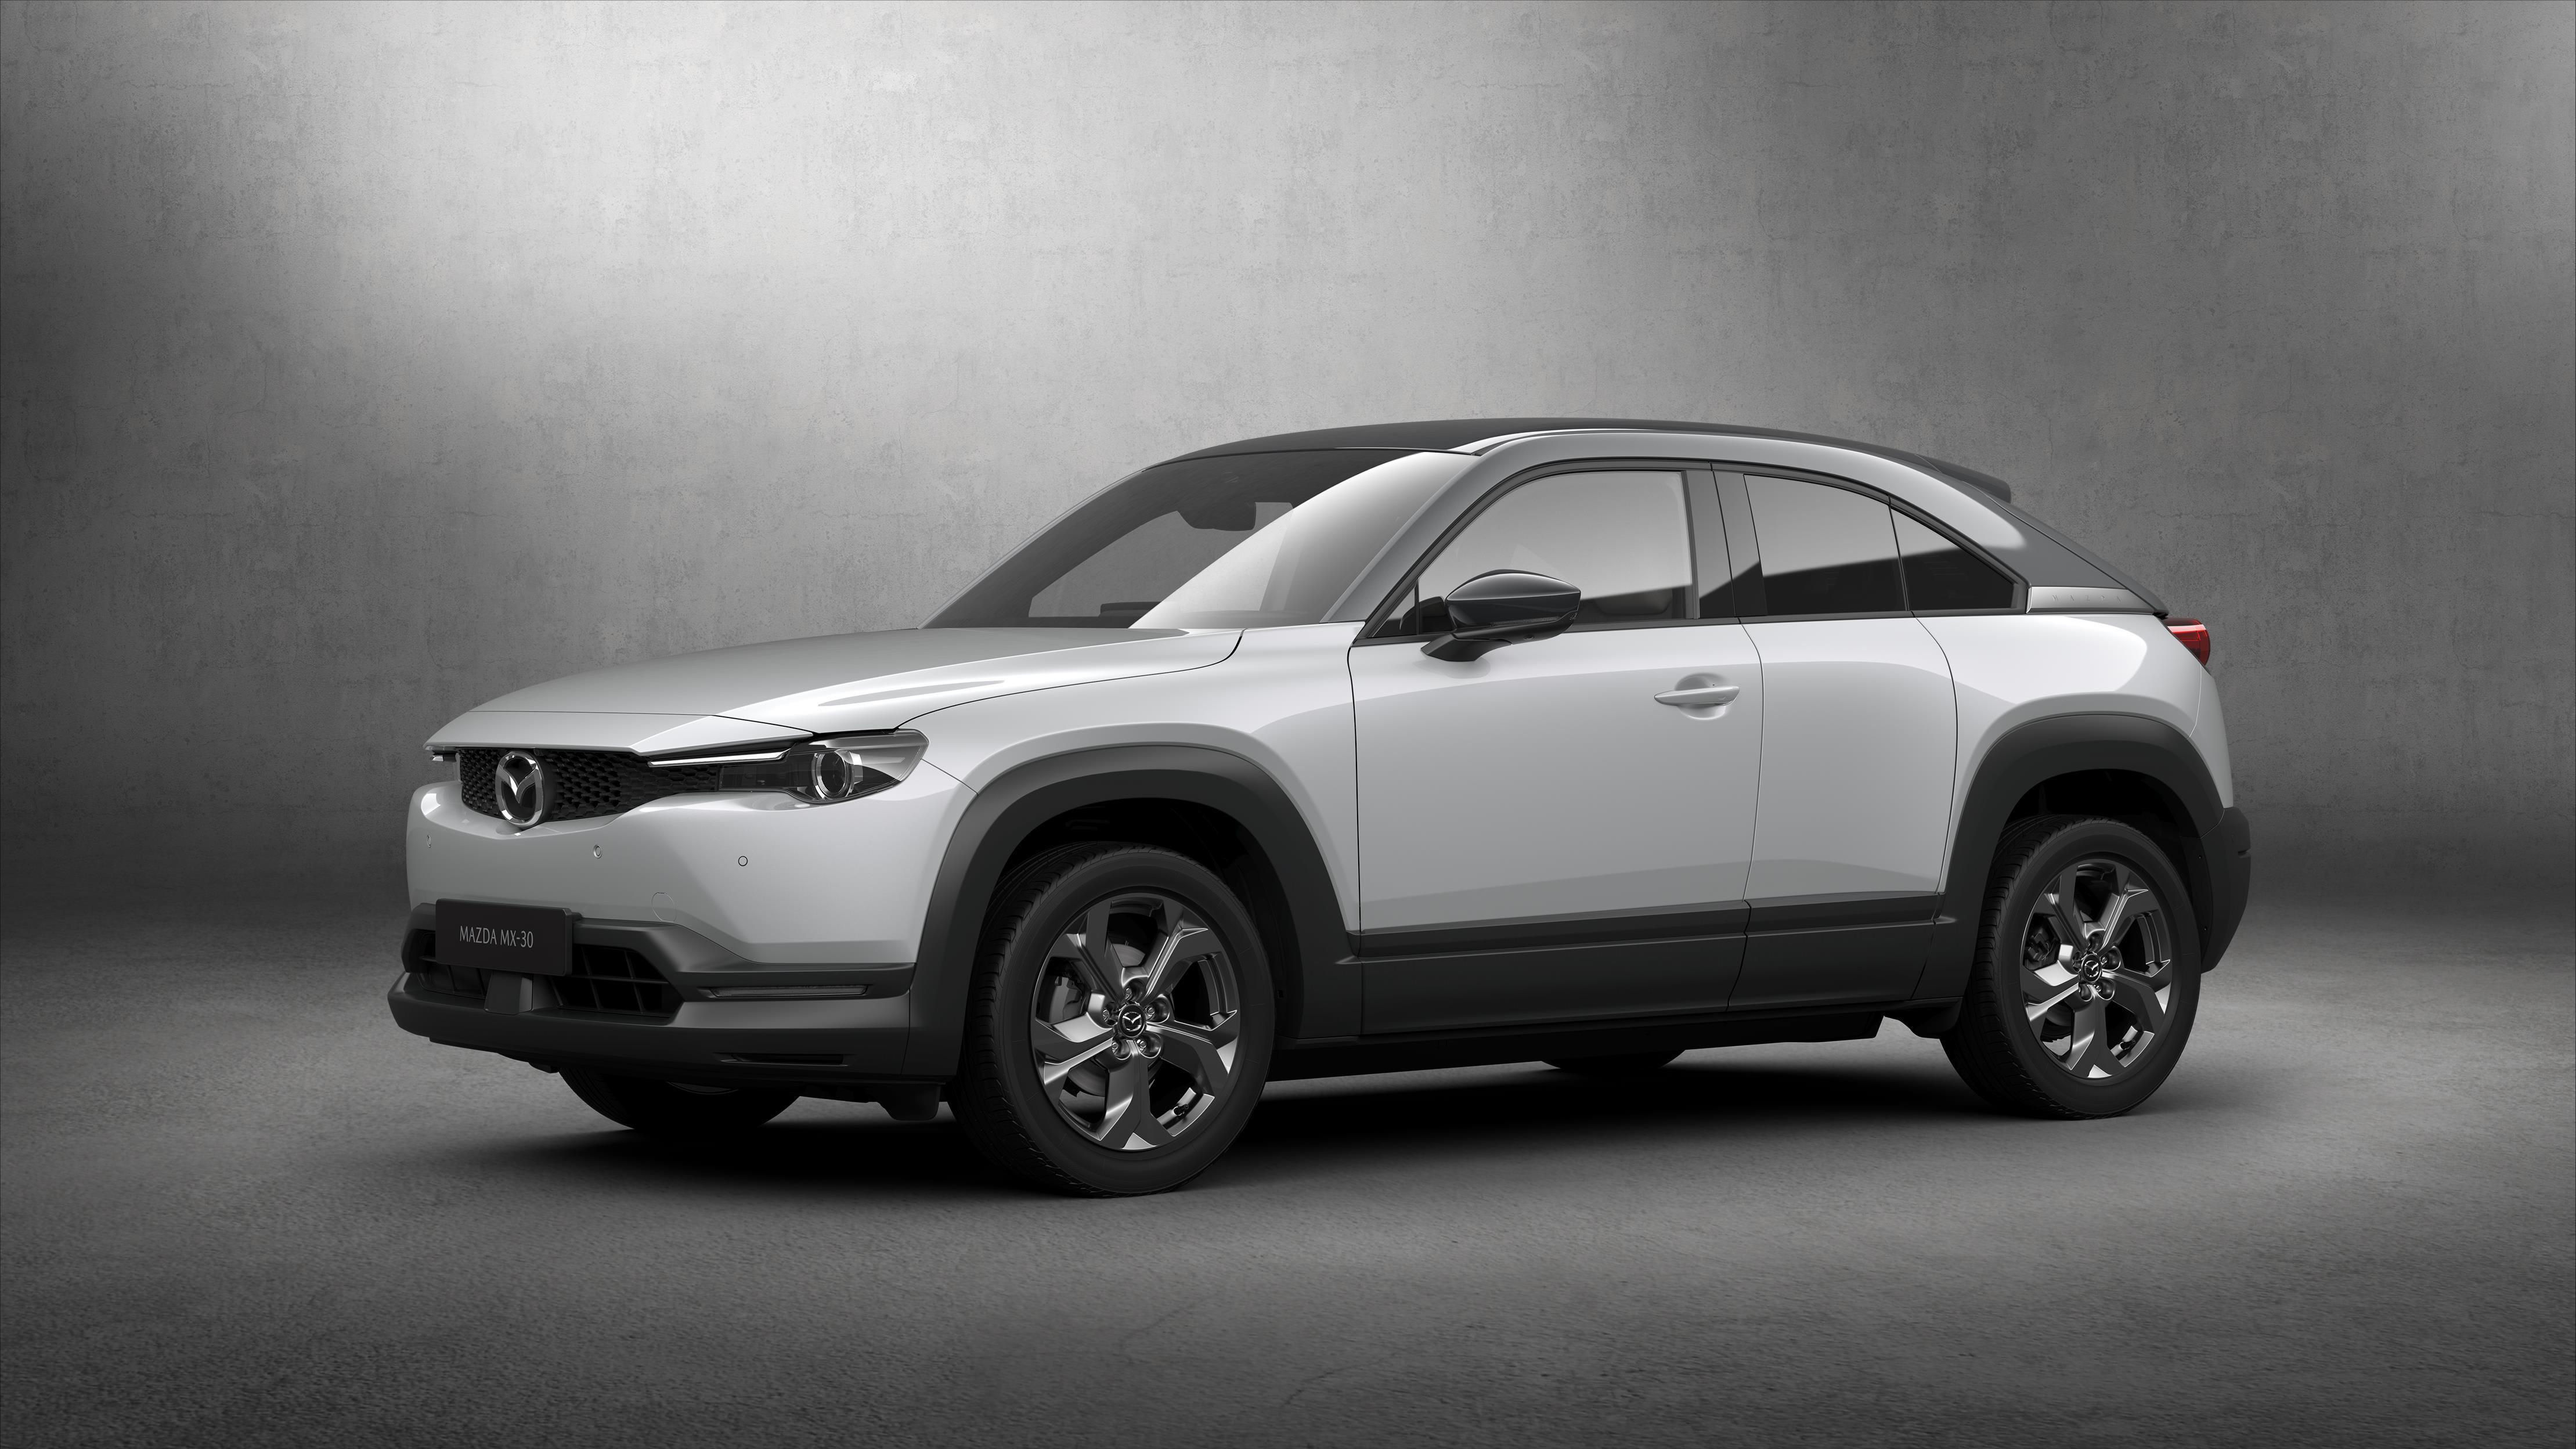 2020 Mazda Mx 30 All Electric Suv Revealed Caradvice